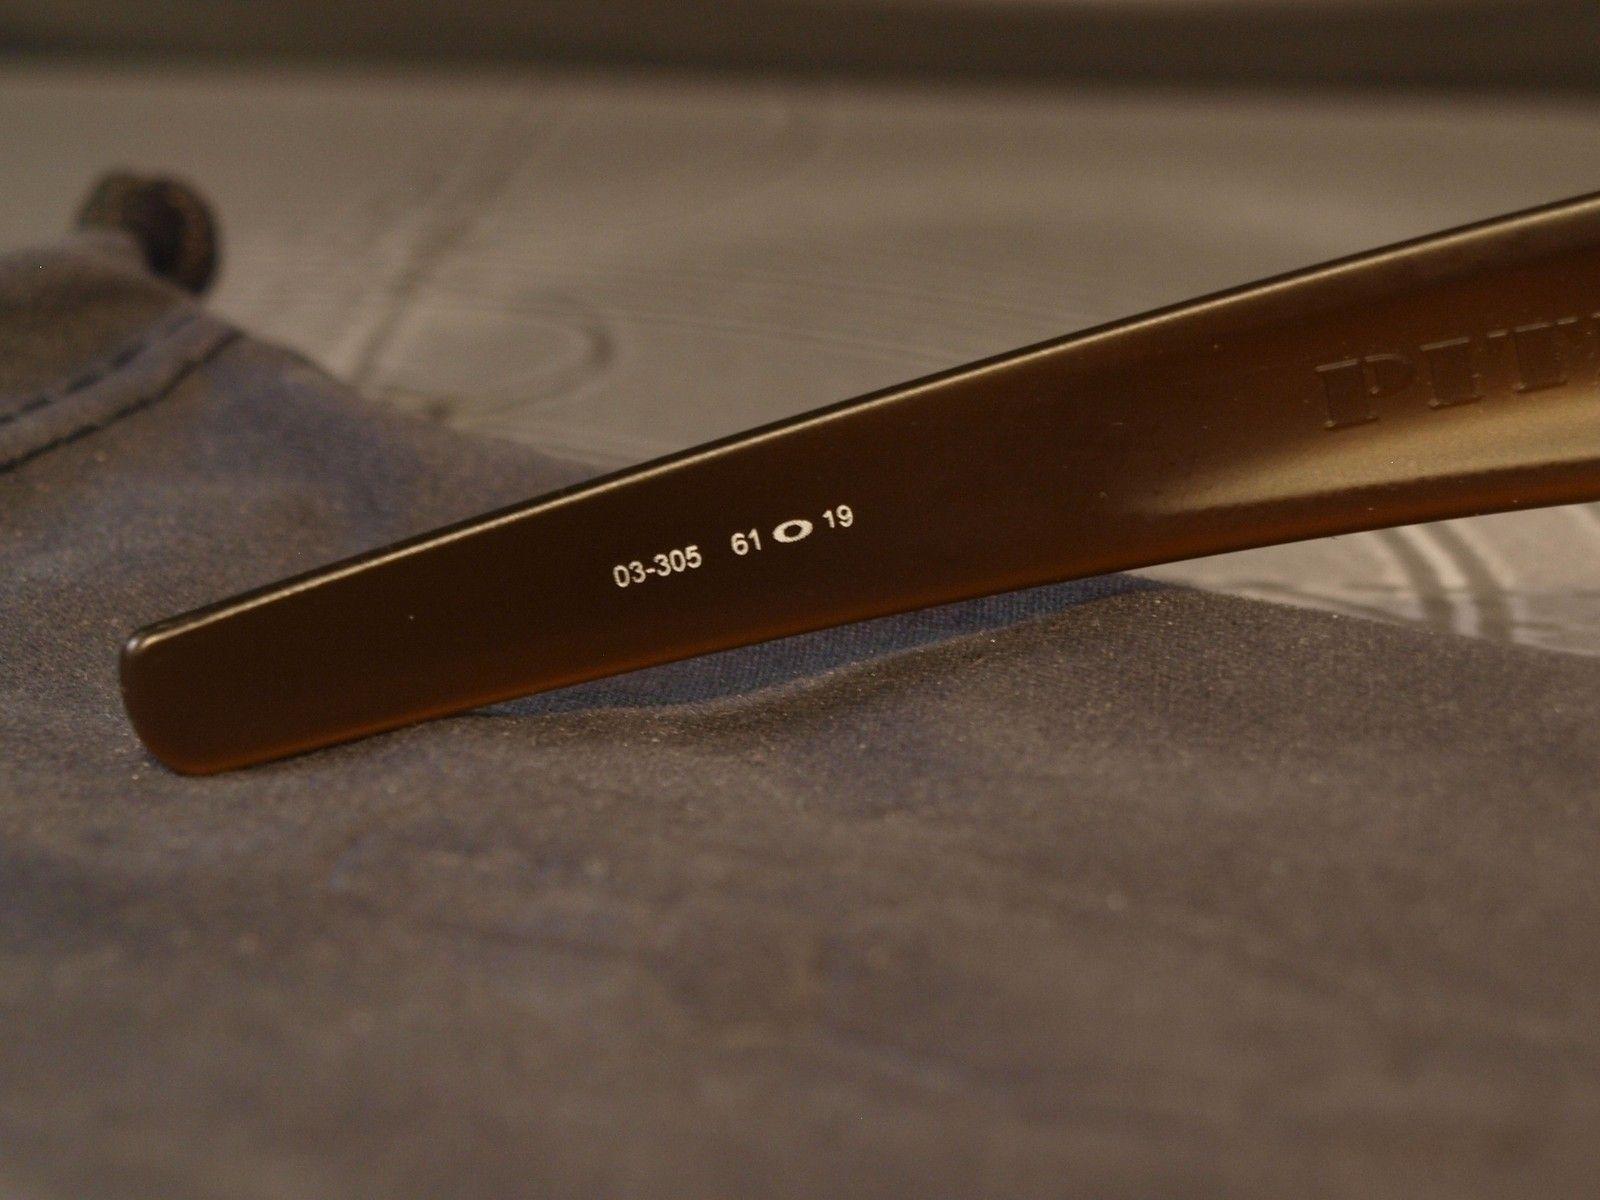 FS Or TRADE: Pit Boss Matte Rootbeer / Bronze Tungsten Iridium Polarized  SKU# 03-305 - pitboss006.jpg